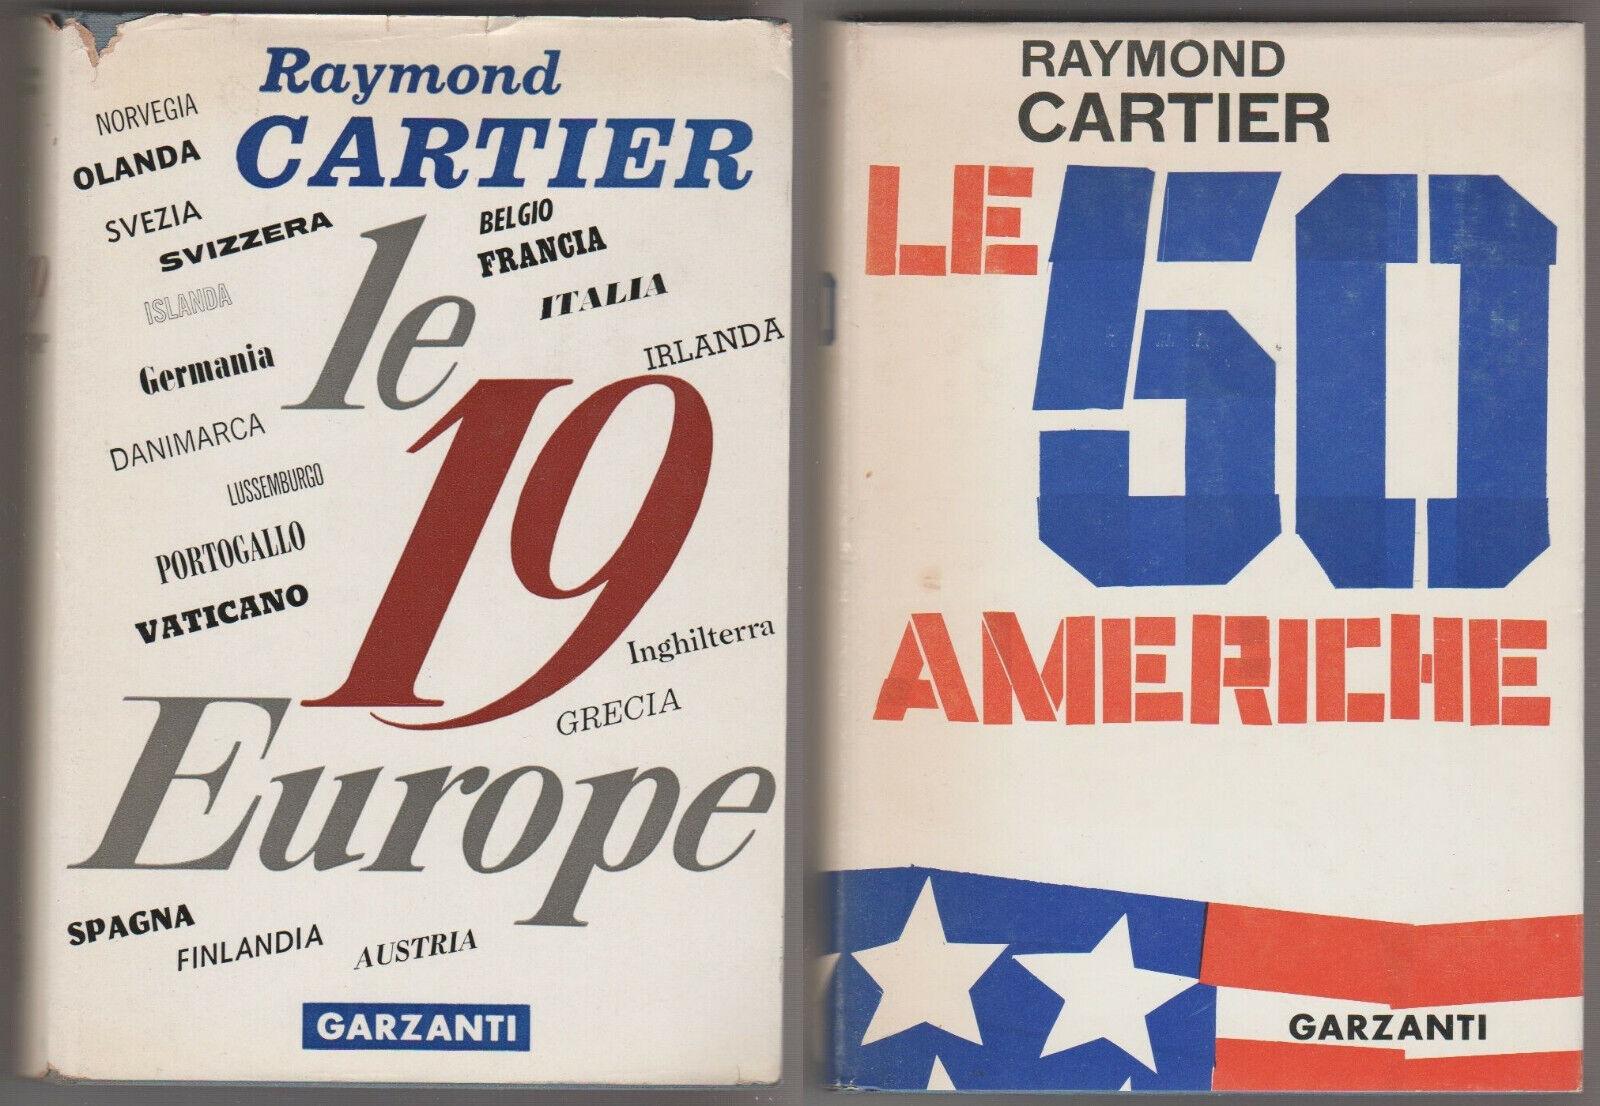 Le 19 Europe + Le 50 Americhe